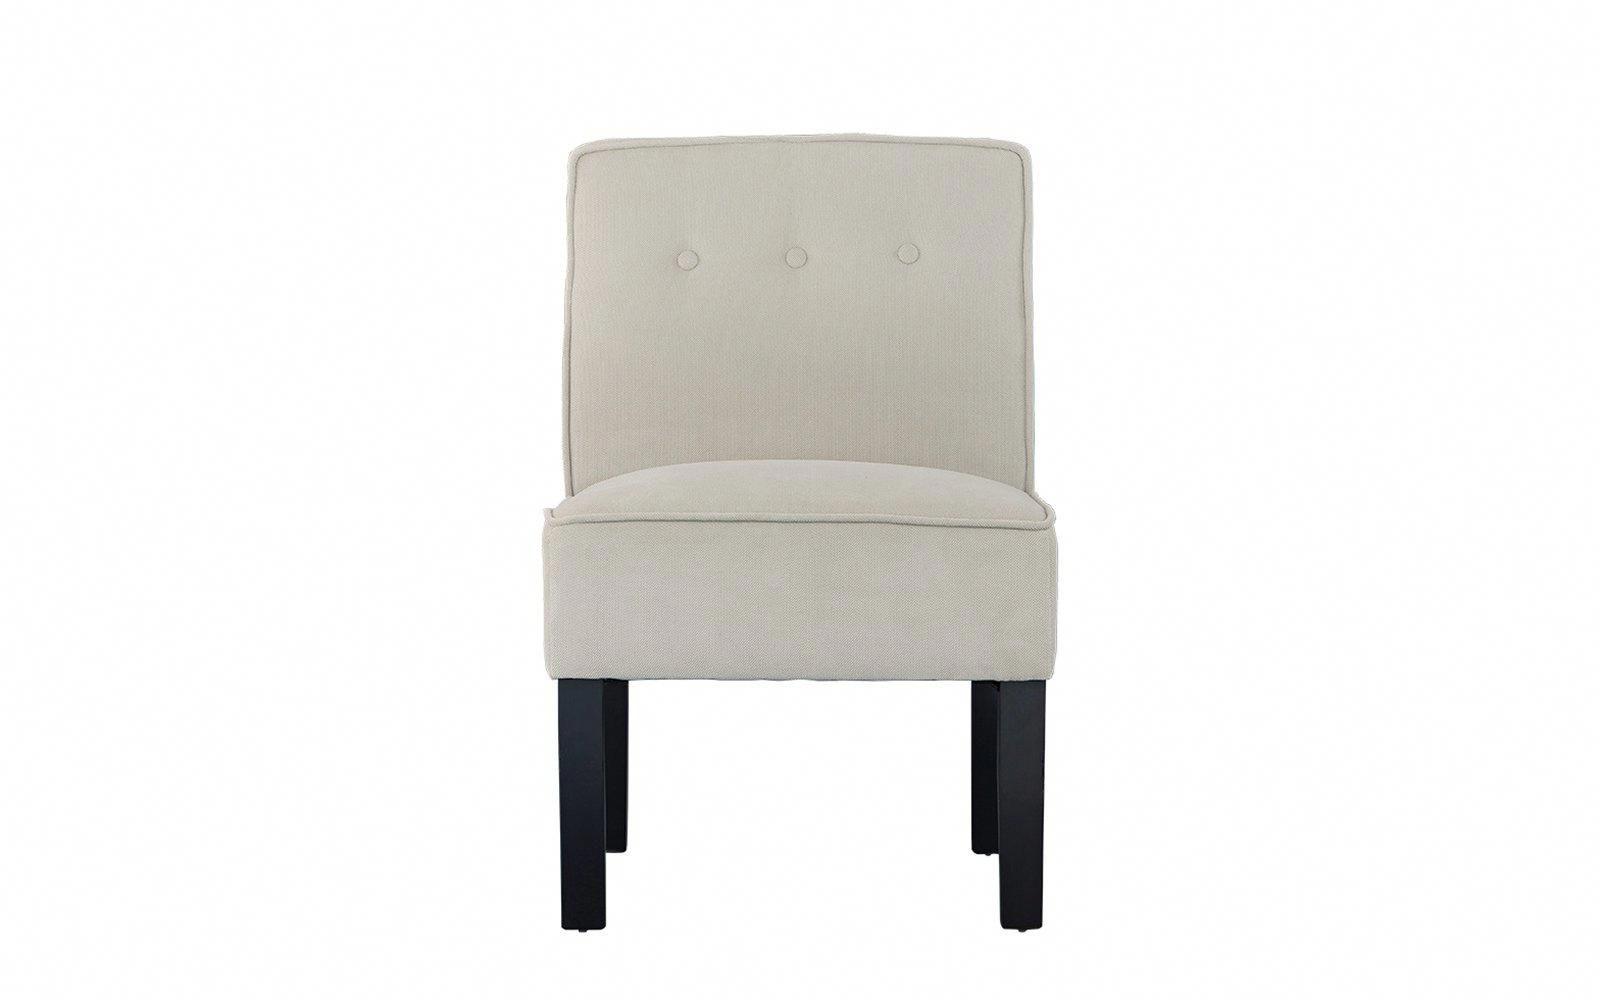 Ames Classic Armless Linen Accent Chair #ameschair (Gallery 14 of 20)